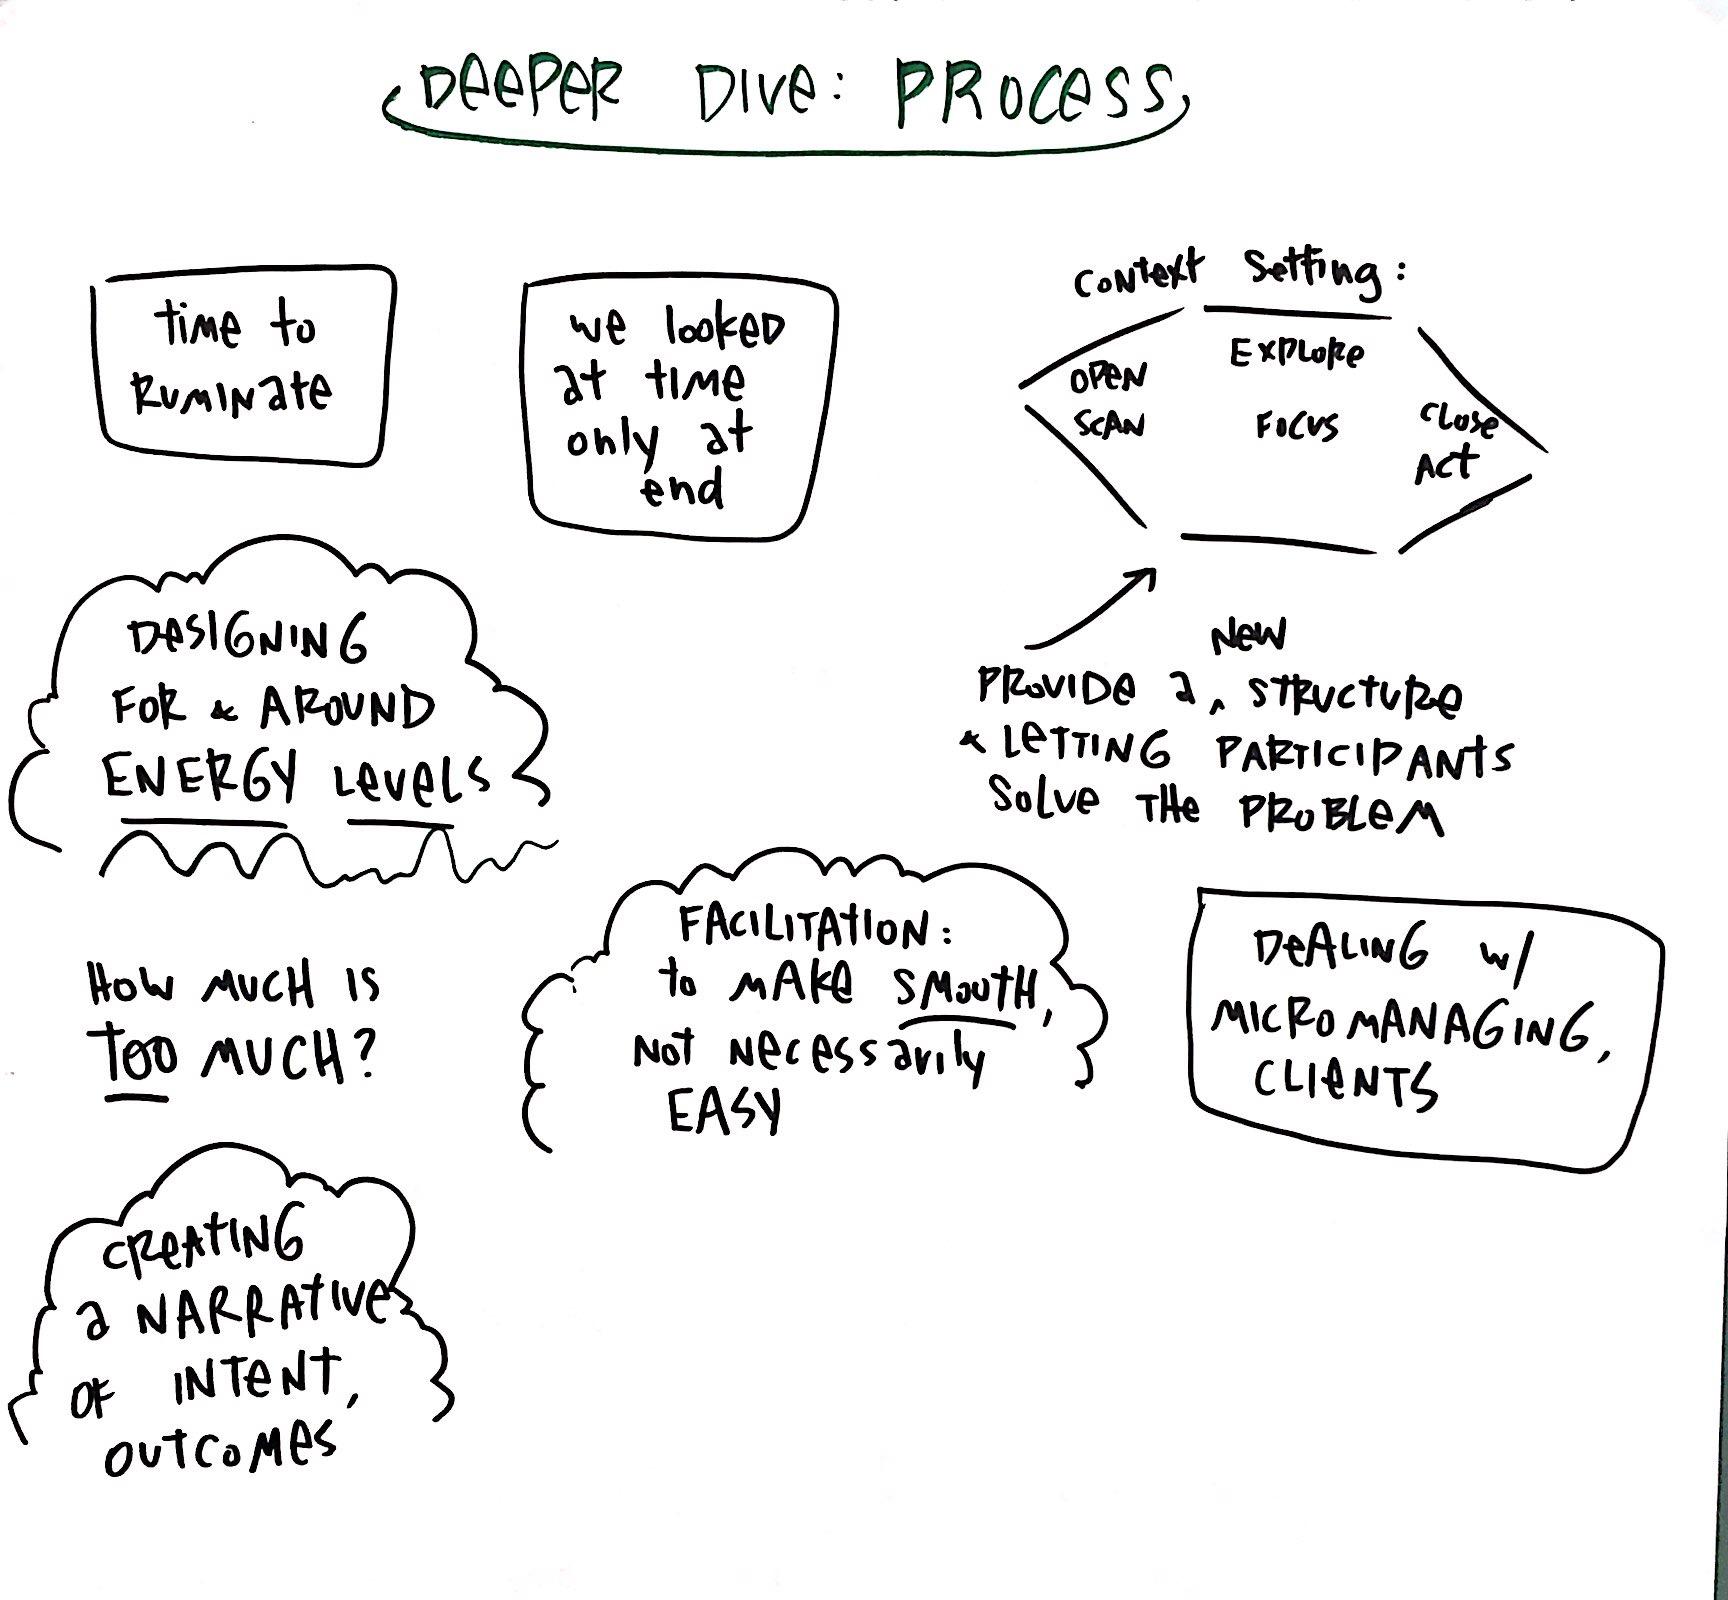 Debrief on designing your session